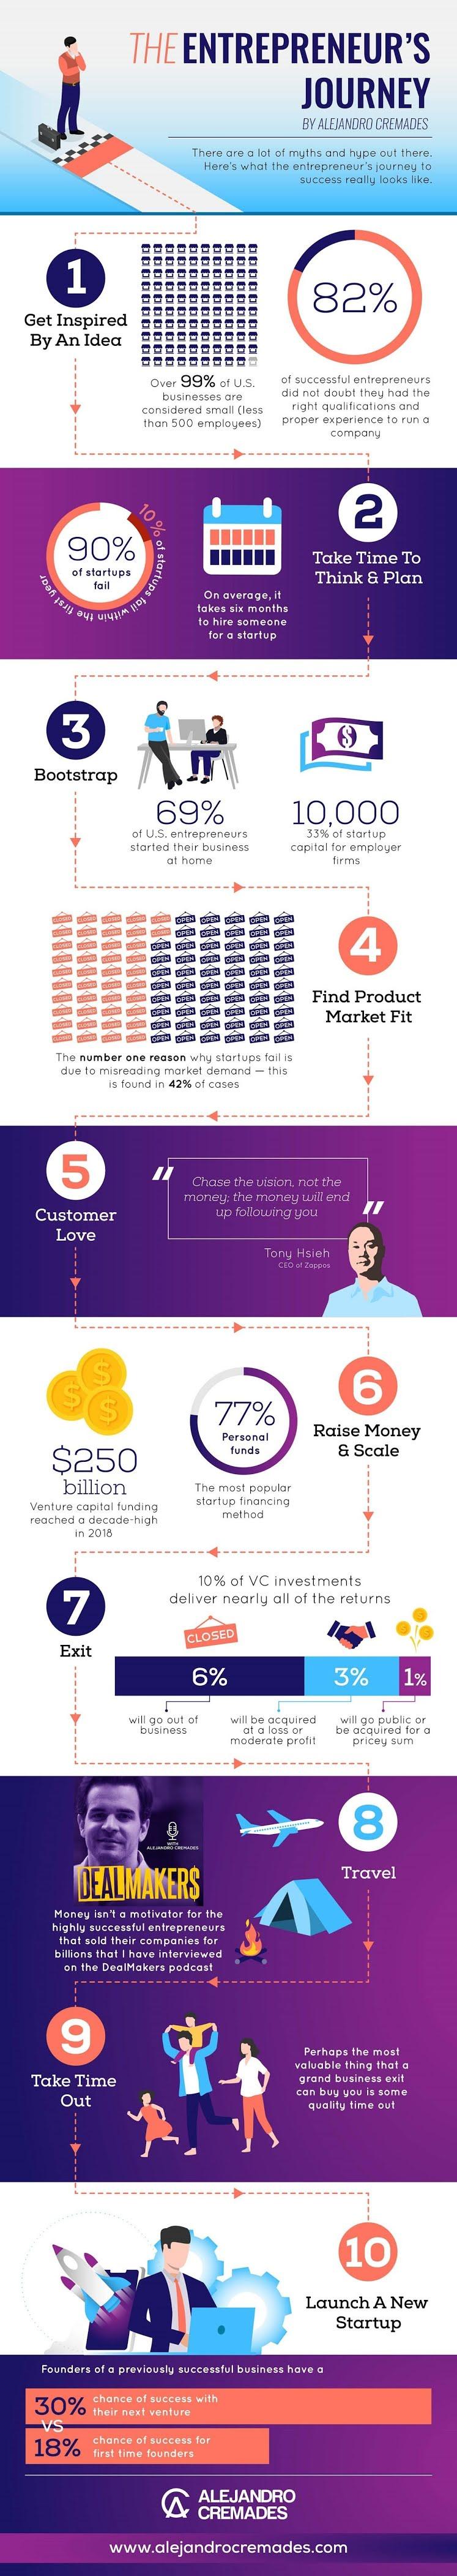 The Entrepreneur's Journey #infographic